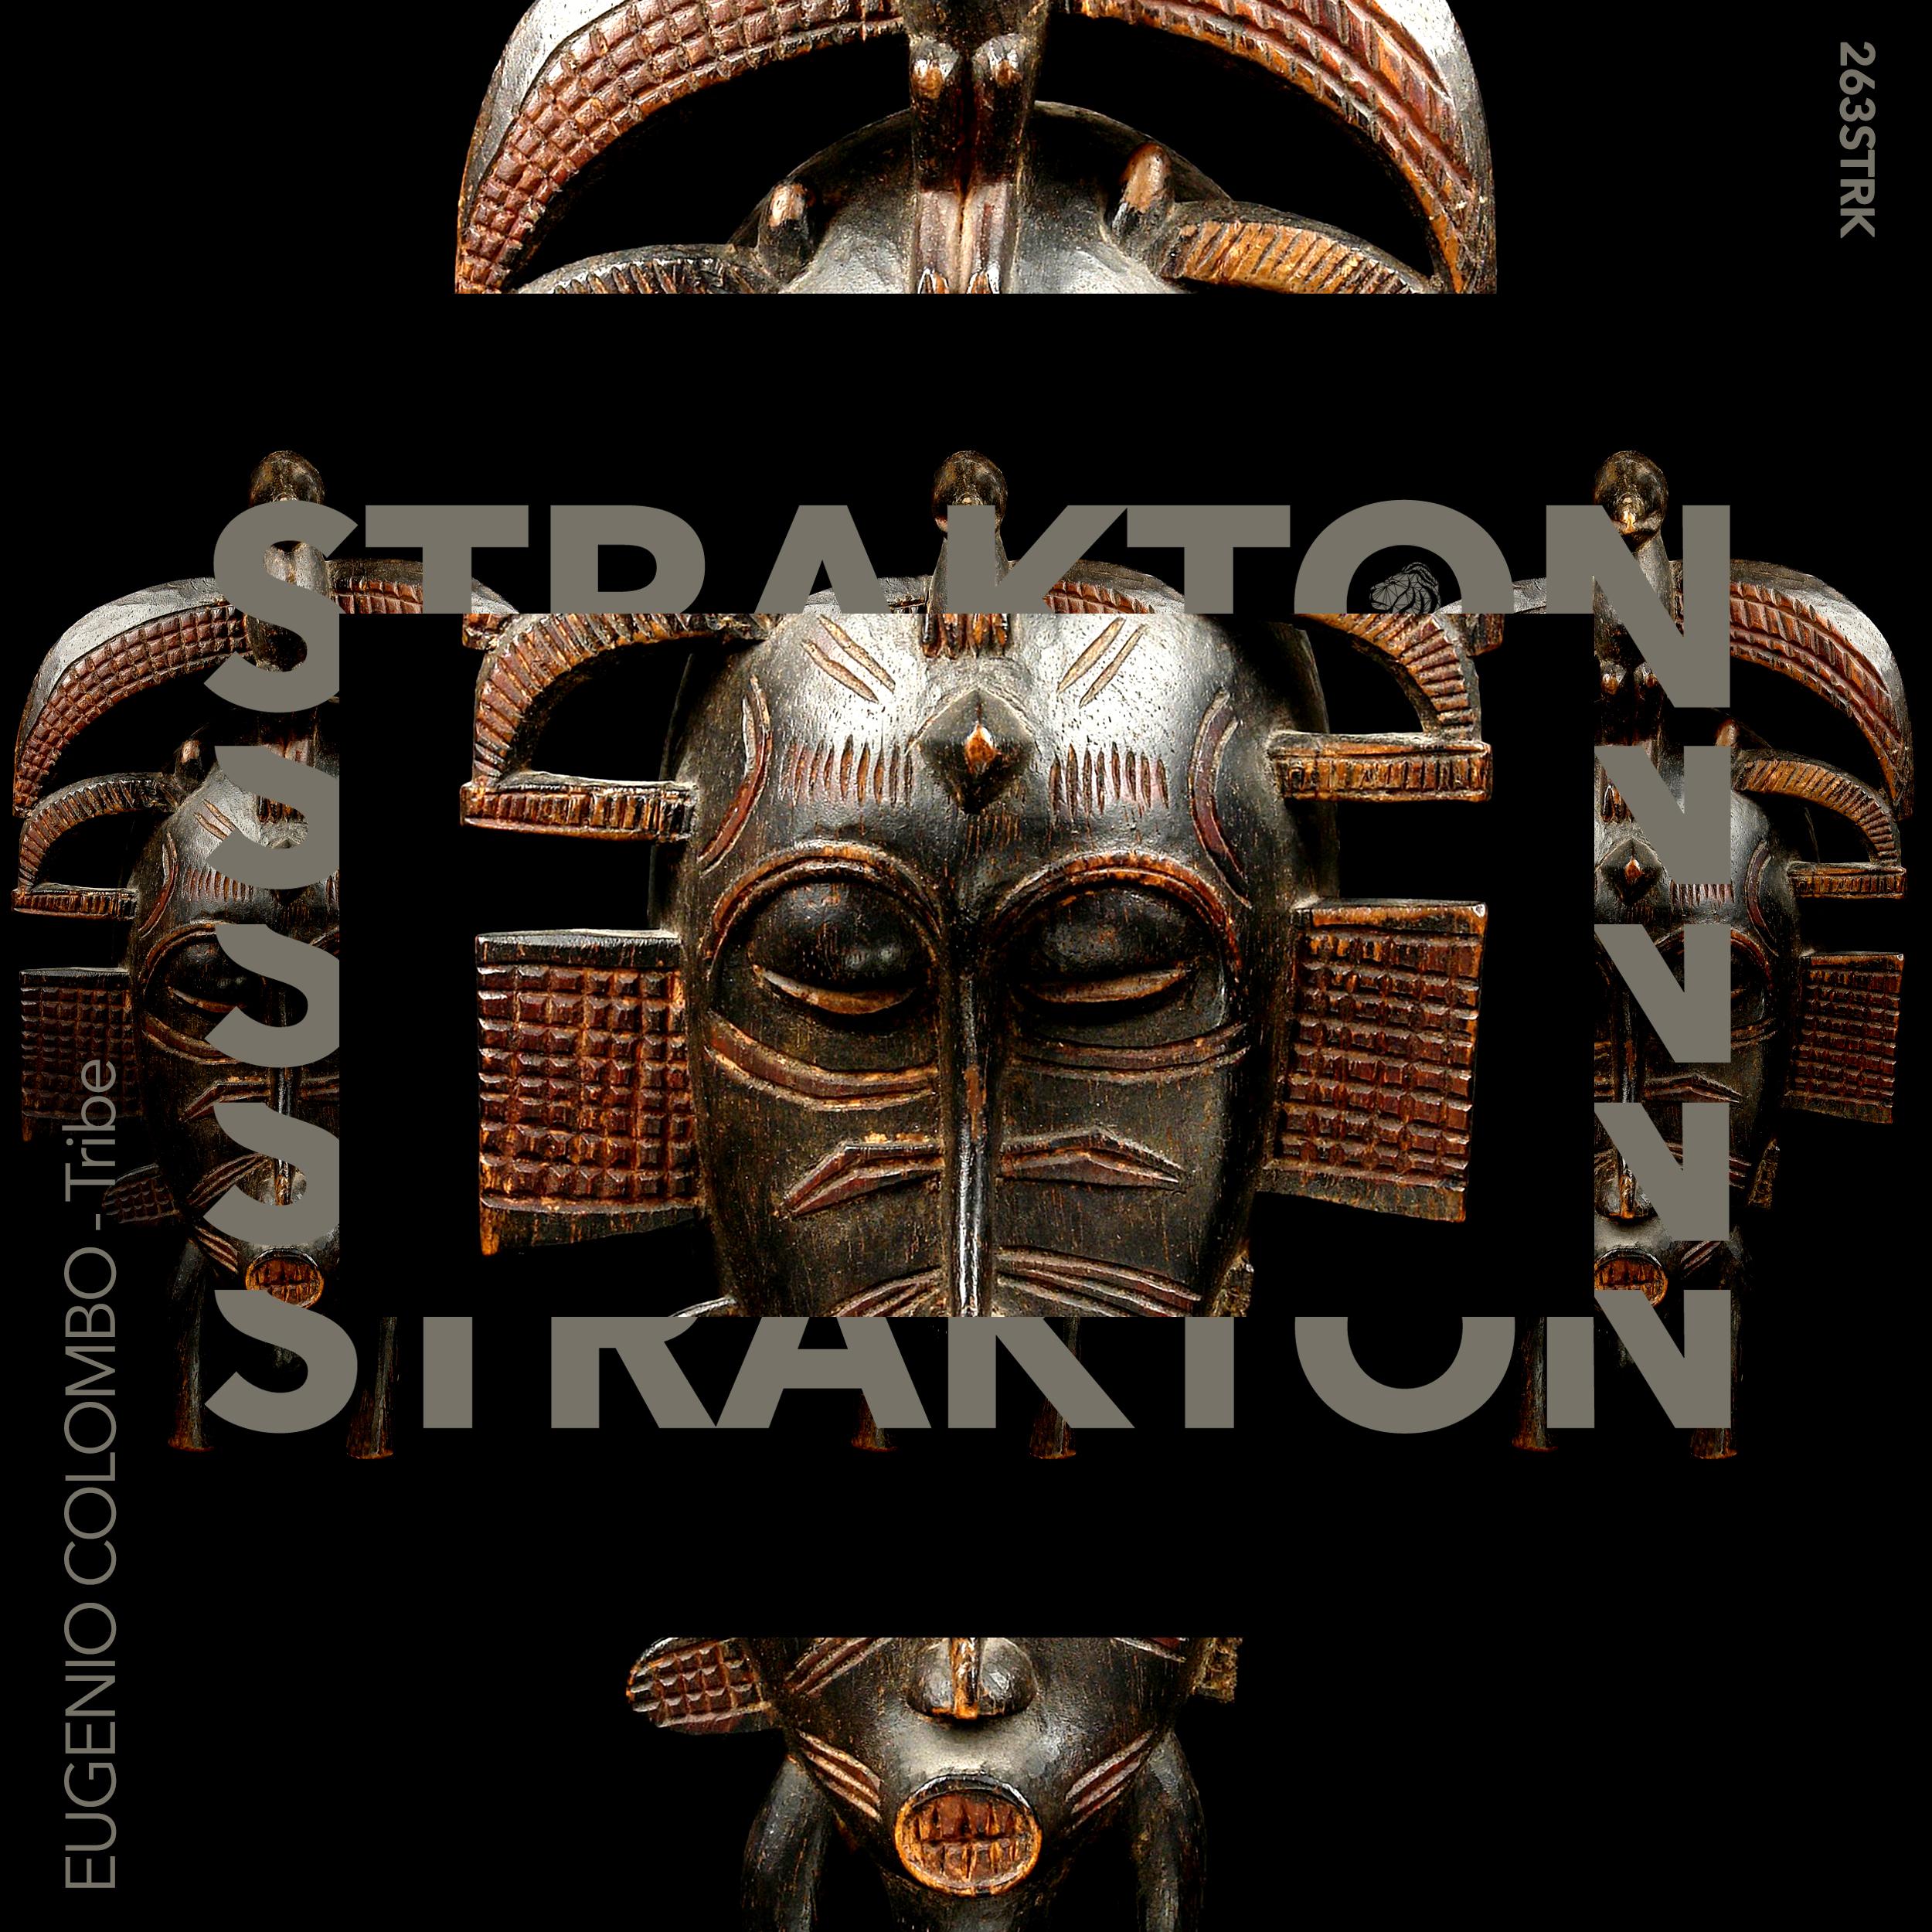 Tribe Image